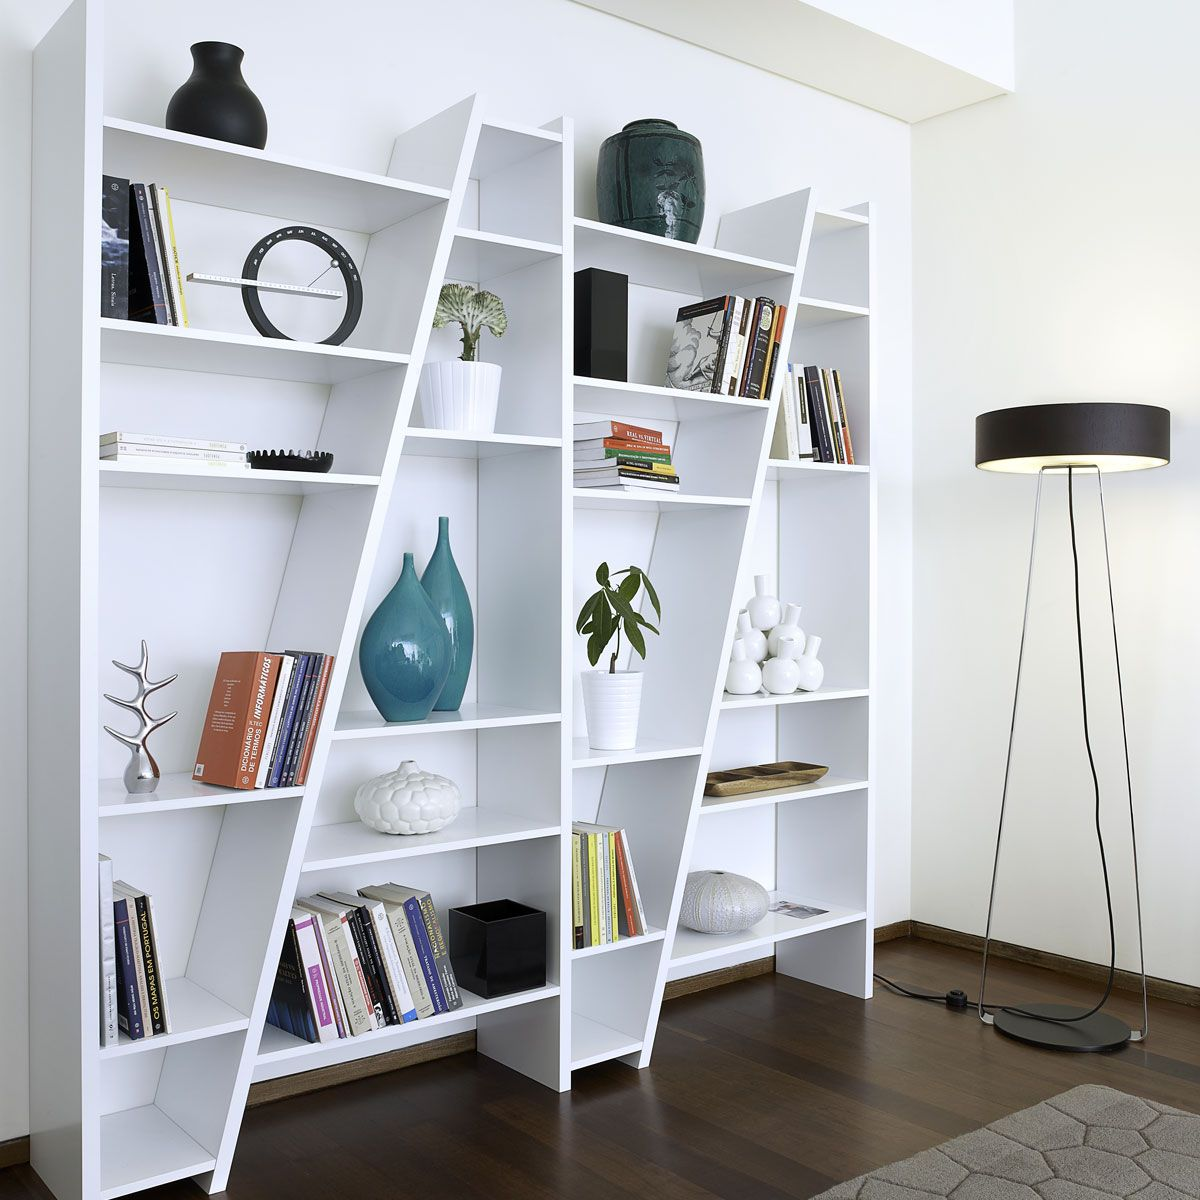 Etag re biblioth que delta blanche bibliotheque etagere biblioth que blanche et diagonale - Etagere echelle blanche ...